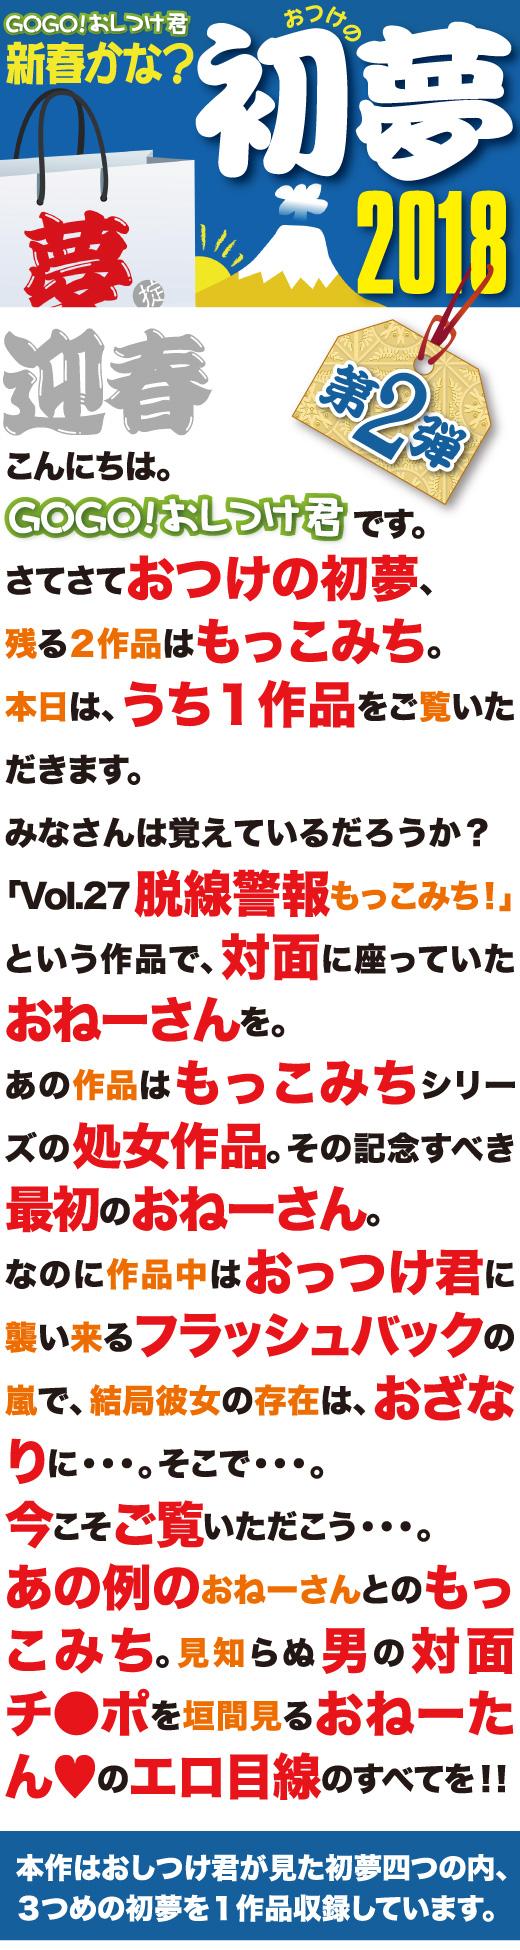 OST_2018HY02_C01.jpg